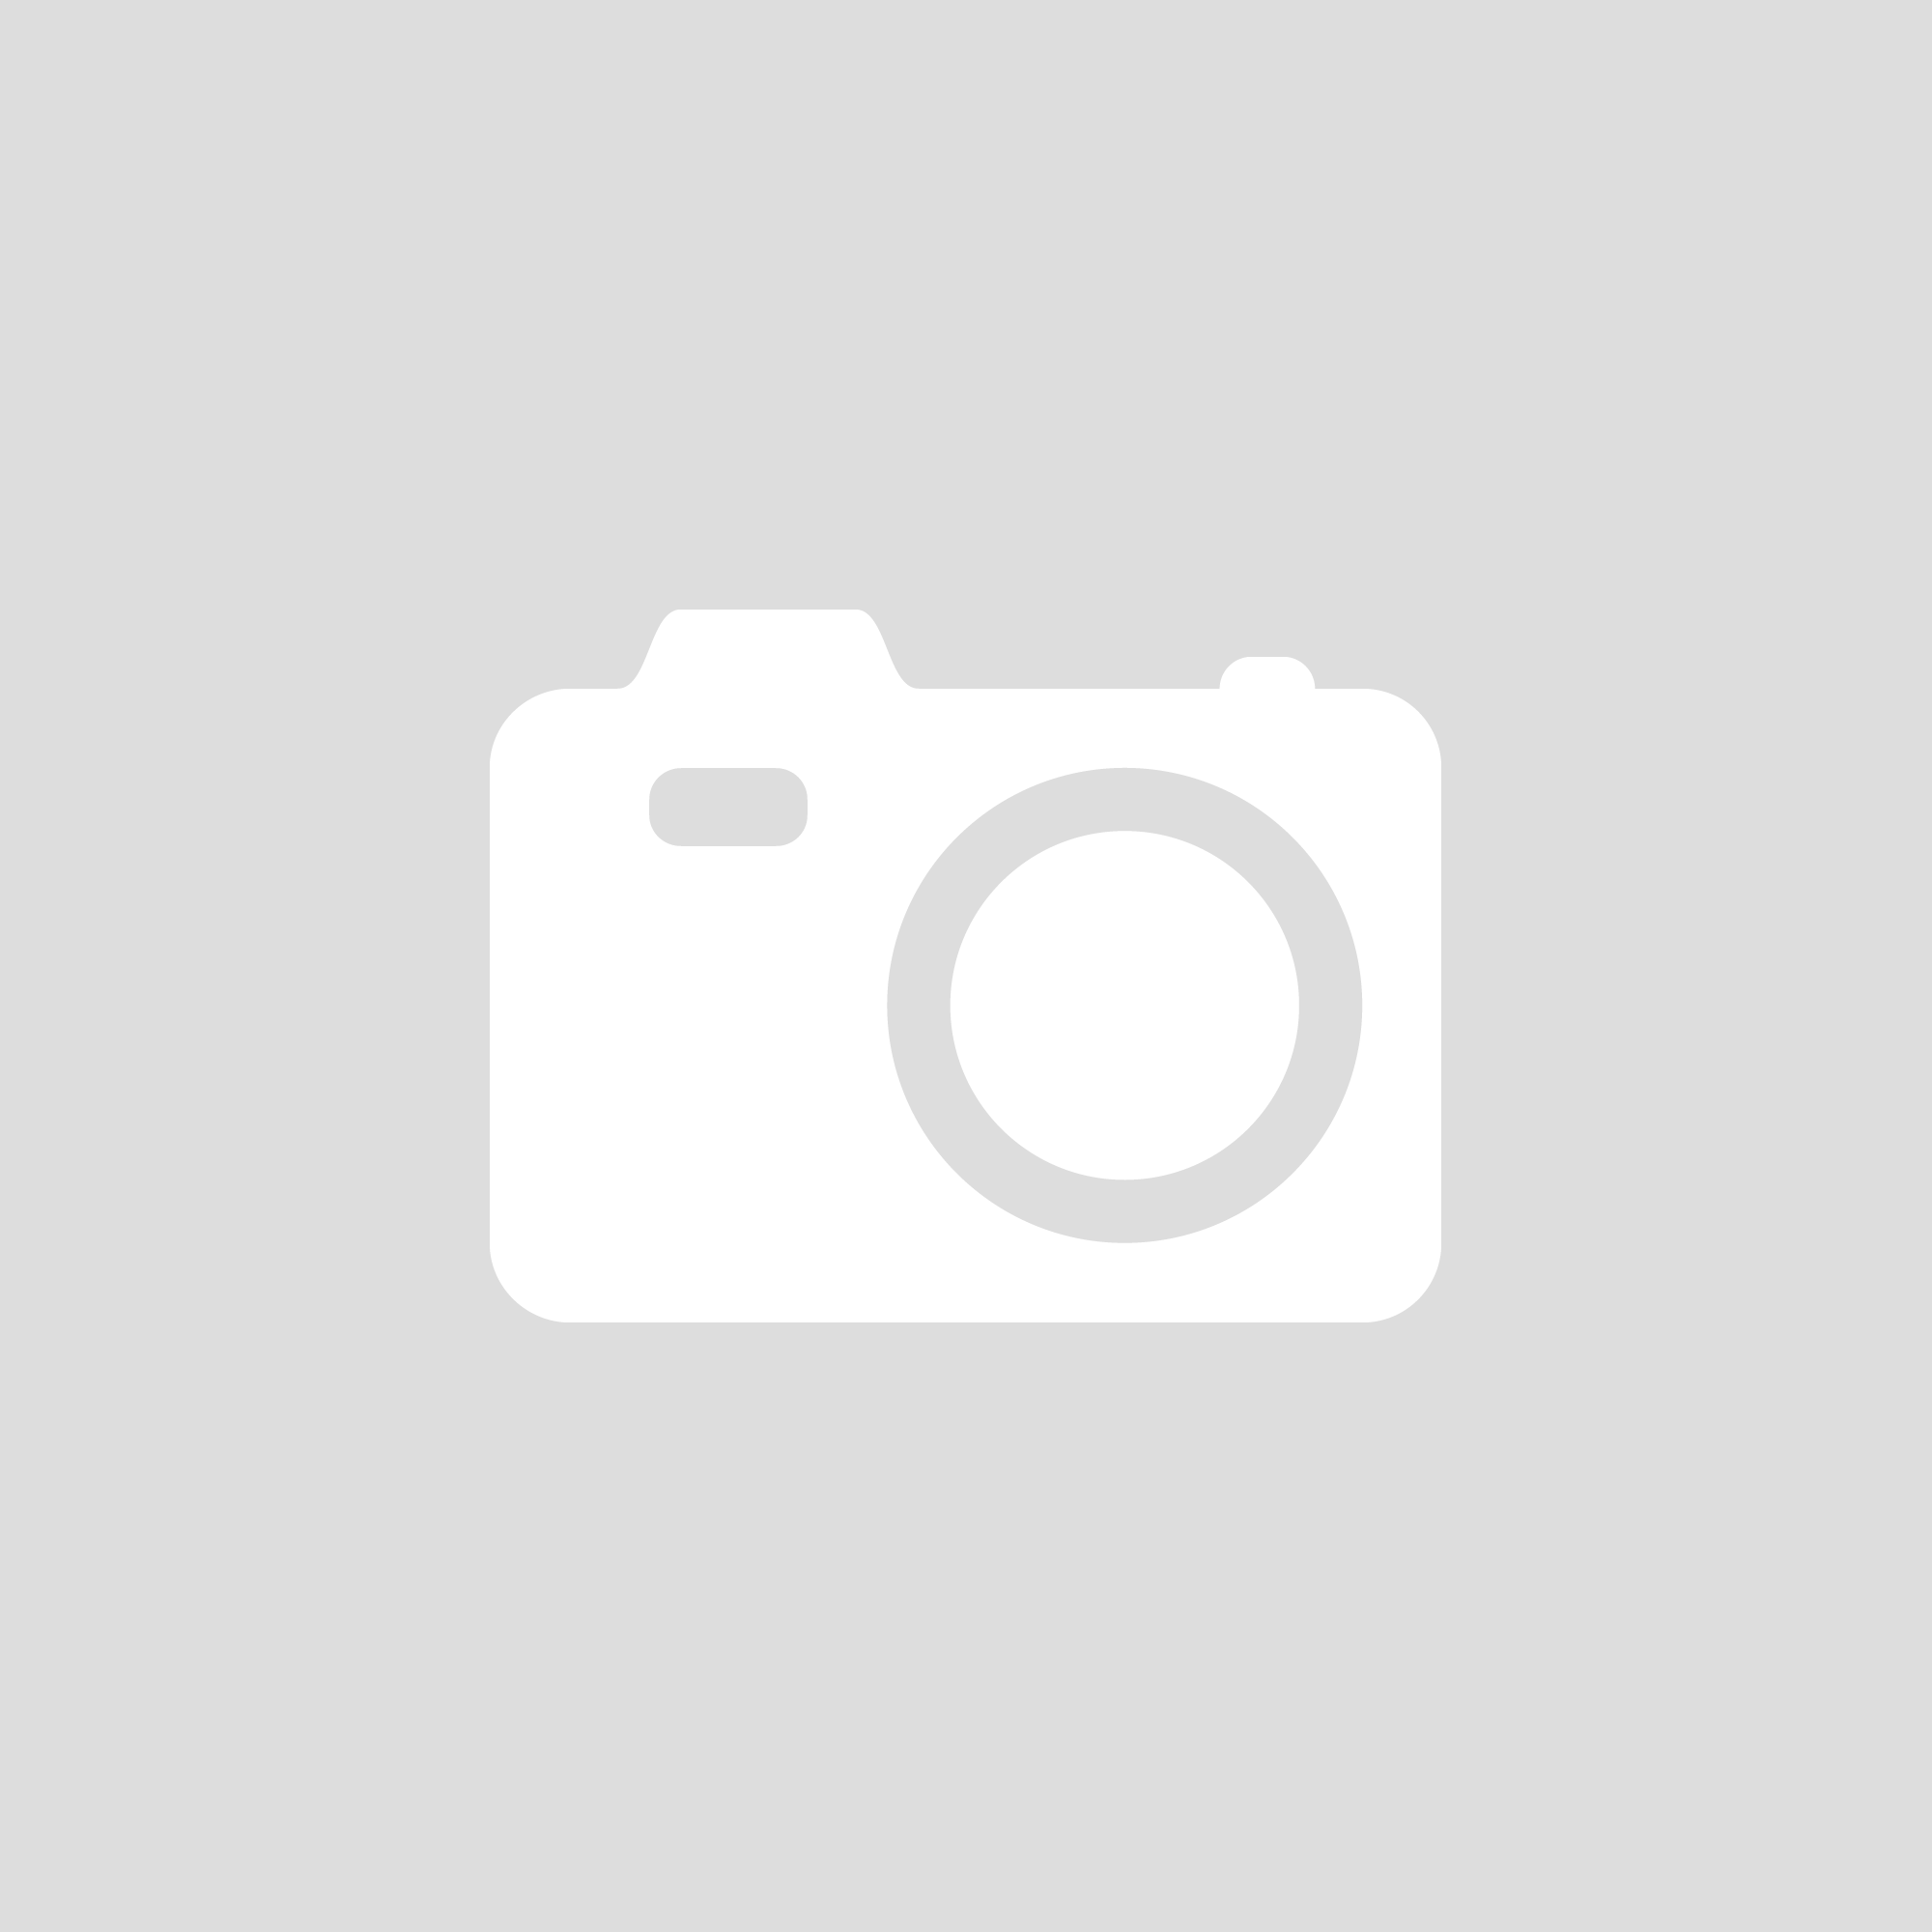 Paola Jacquard Trail Cream Wallpaper by Seriano GB 65156